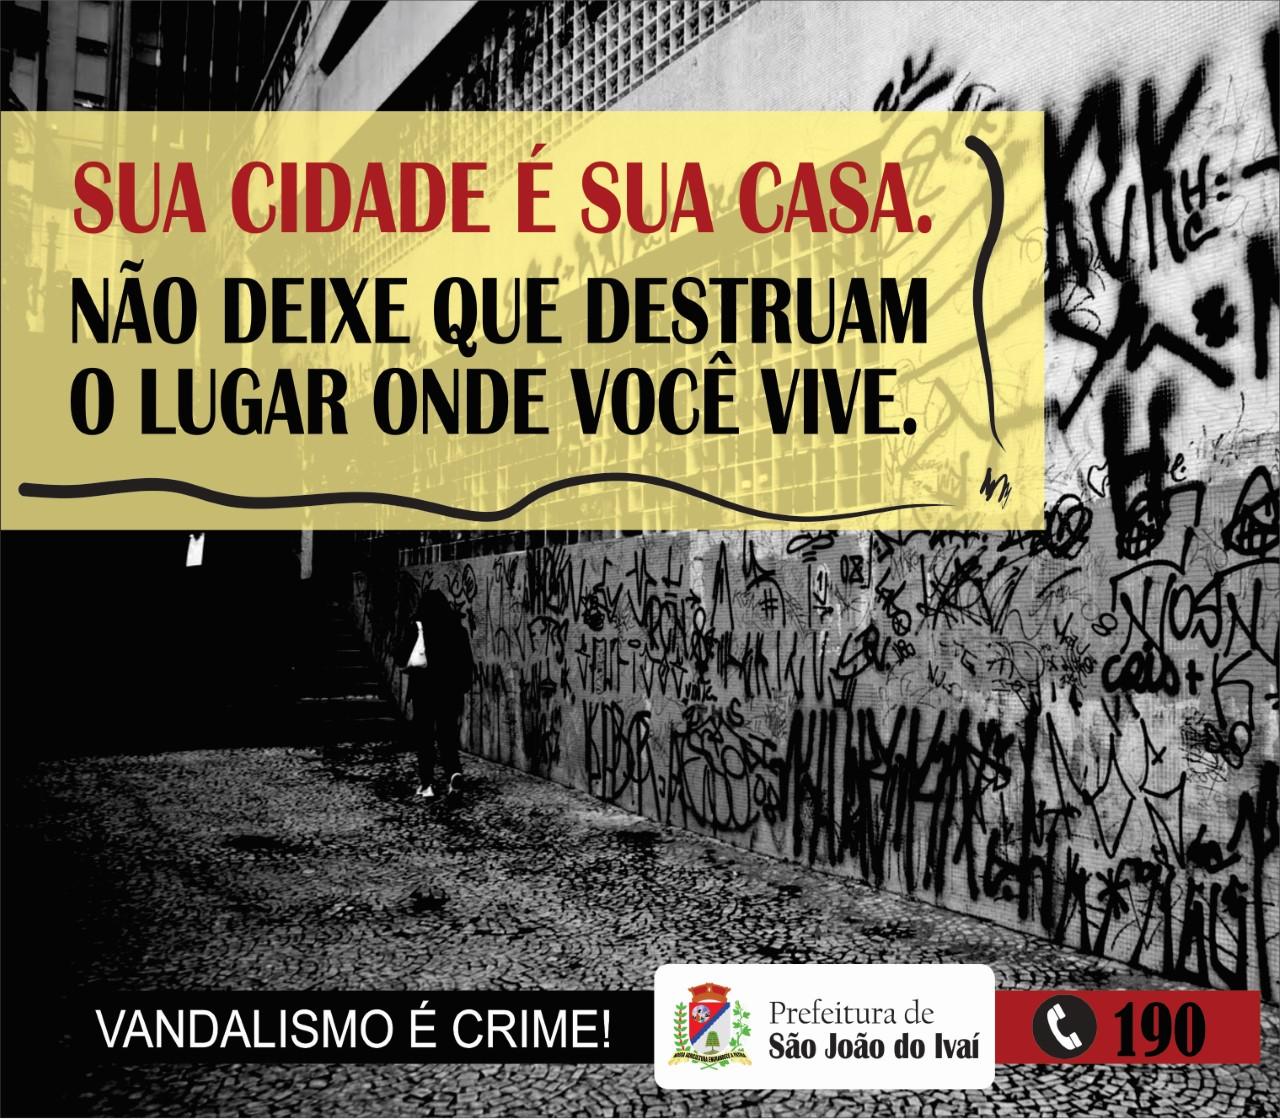 SÃO JOÃO DO IVAÍ - PREFEITURA